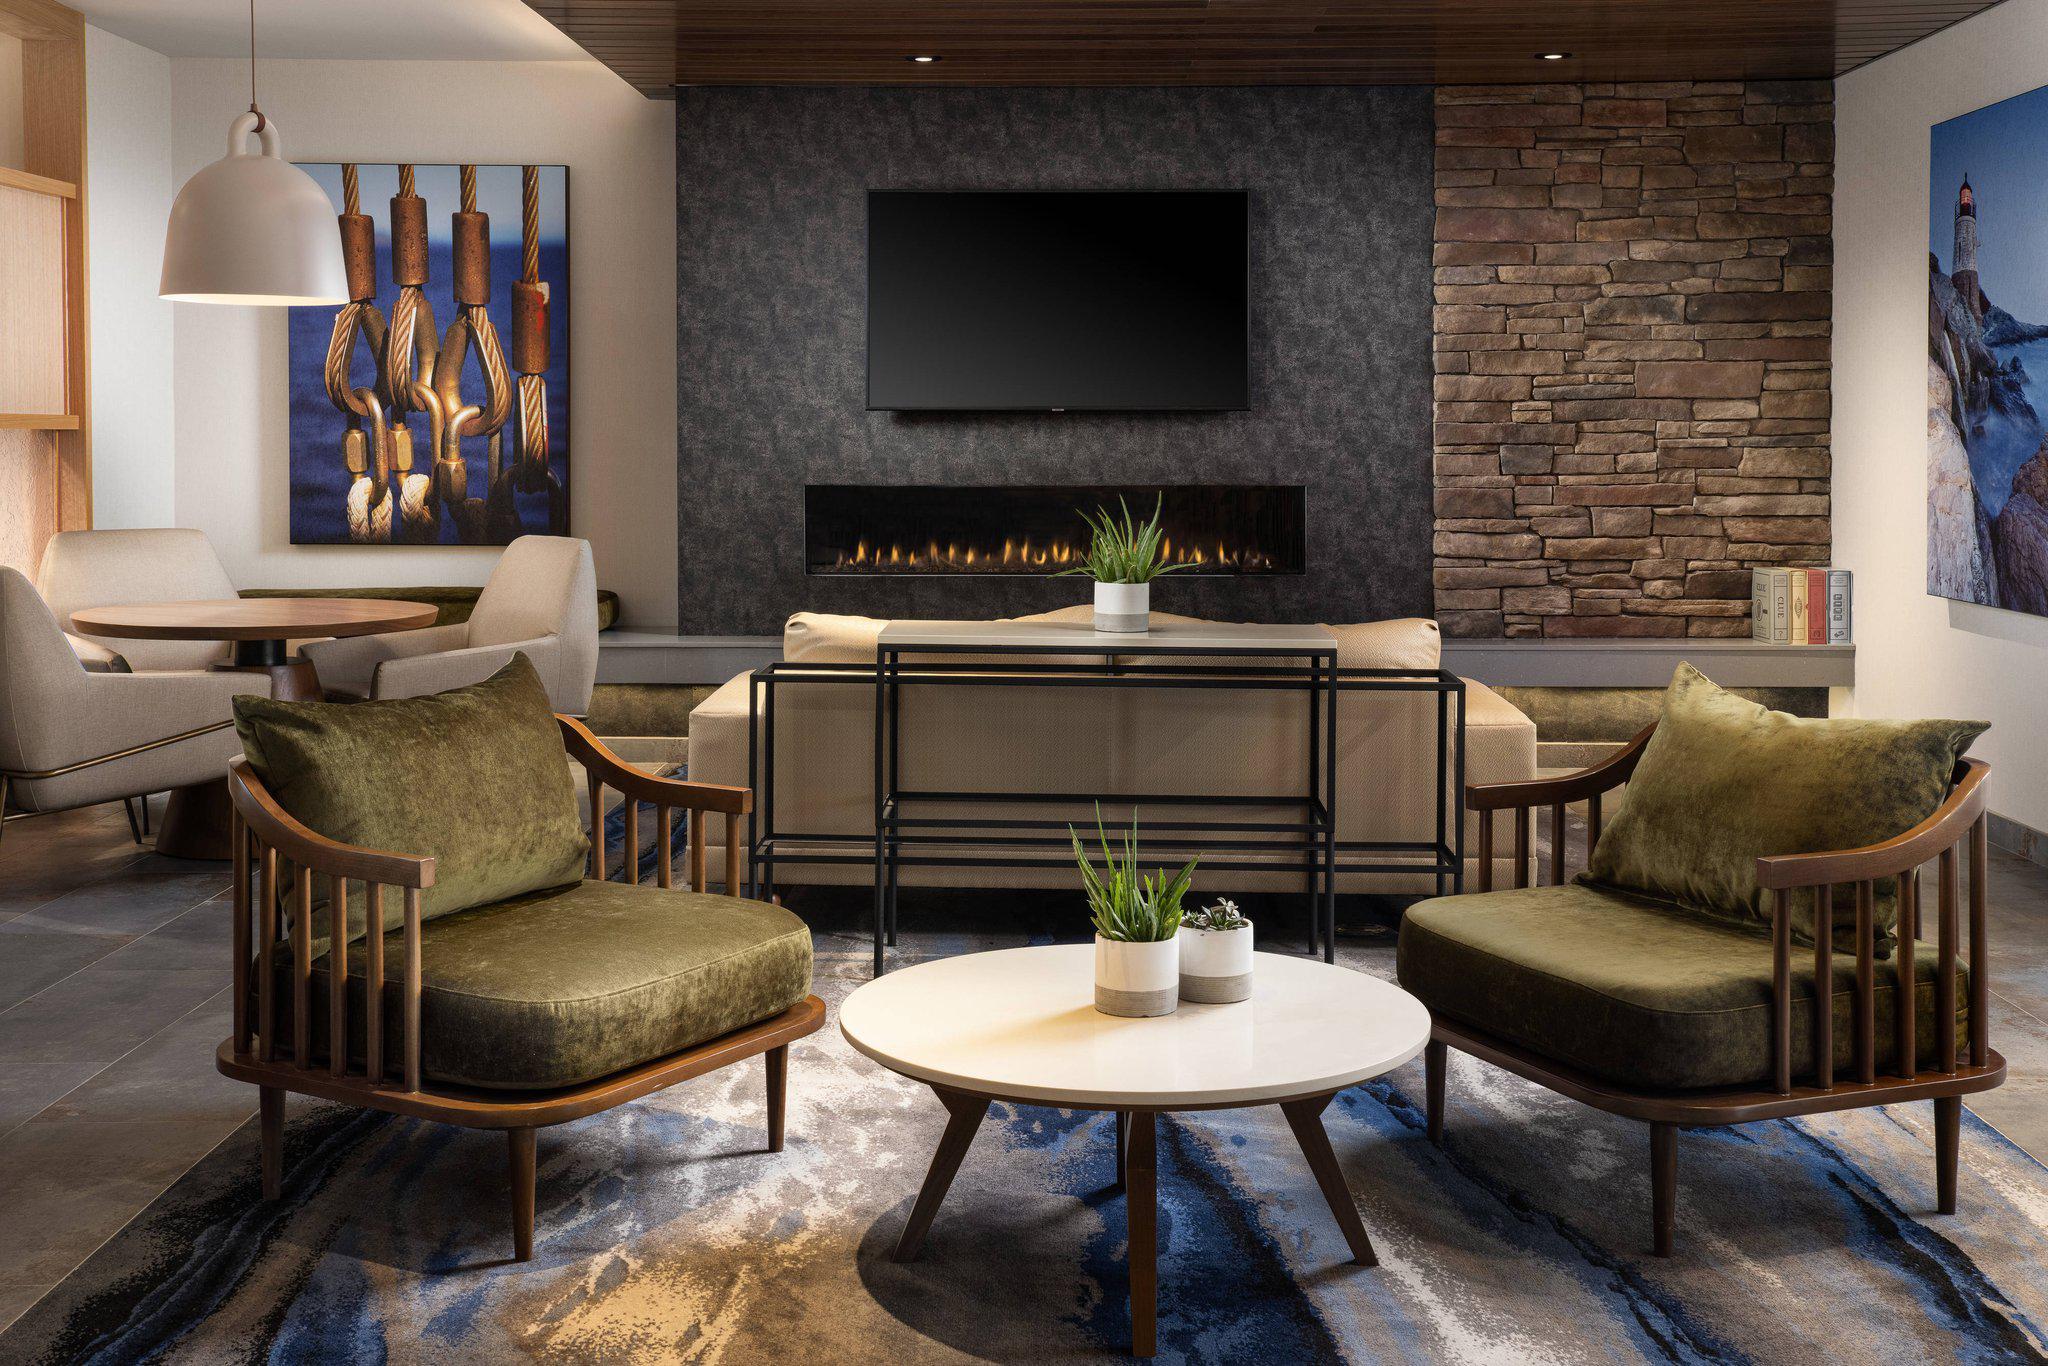 Fairfield Inn & Suites by Marriott South Kingstown Newport Area